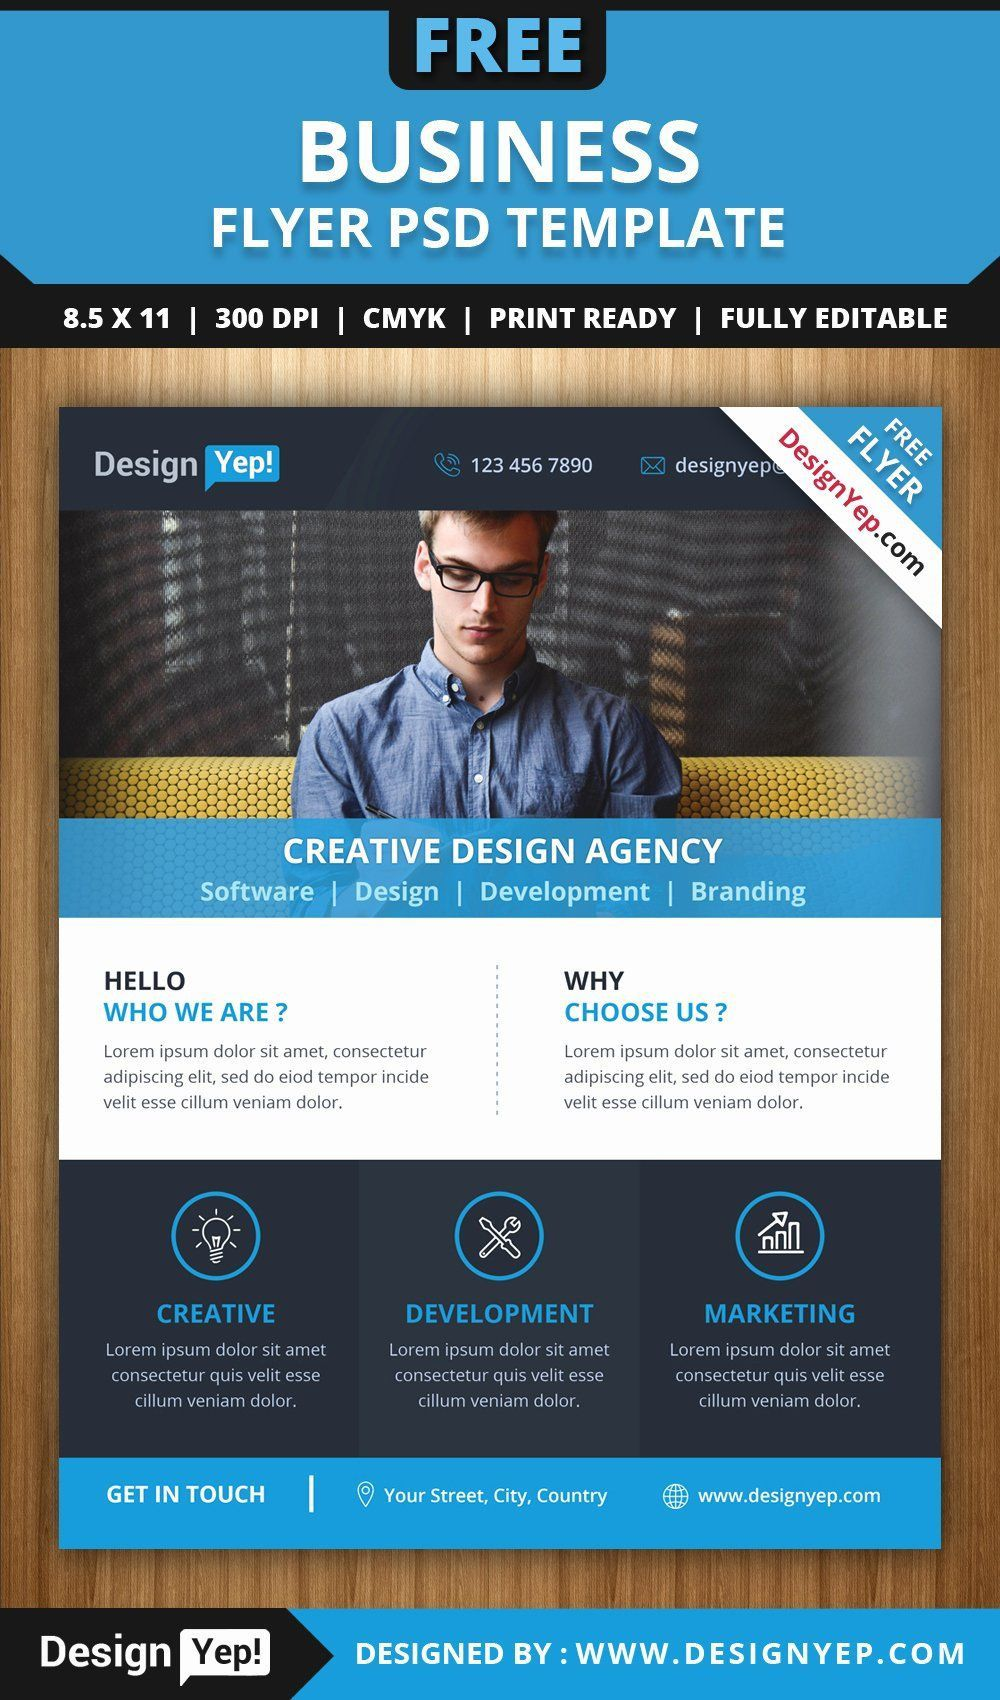 001 Singular Busines Flyer Template Free Download Concept  Psd DesignFull